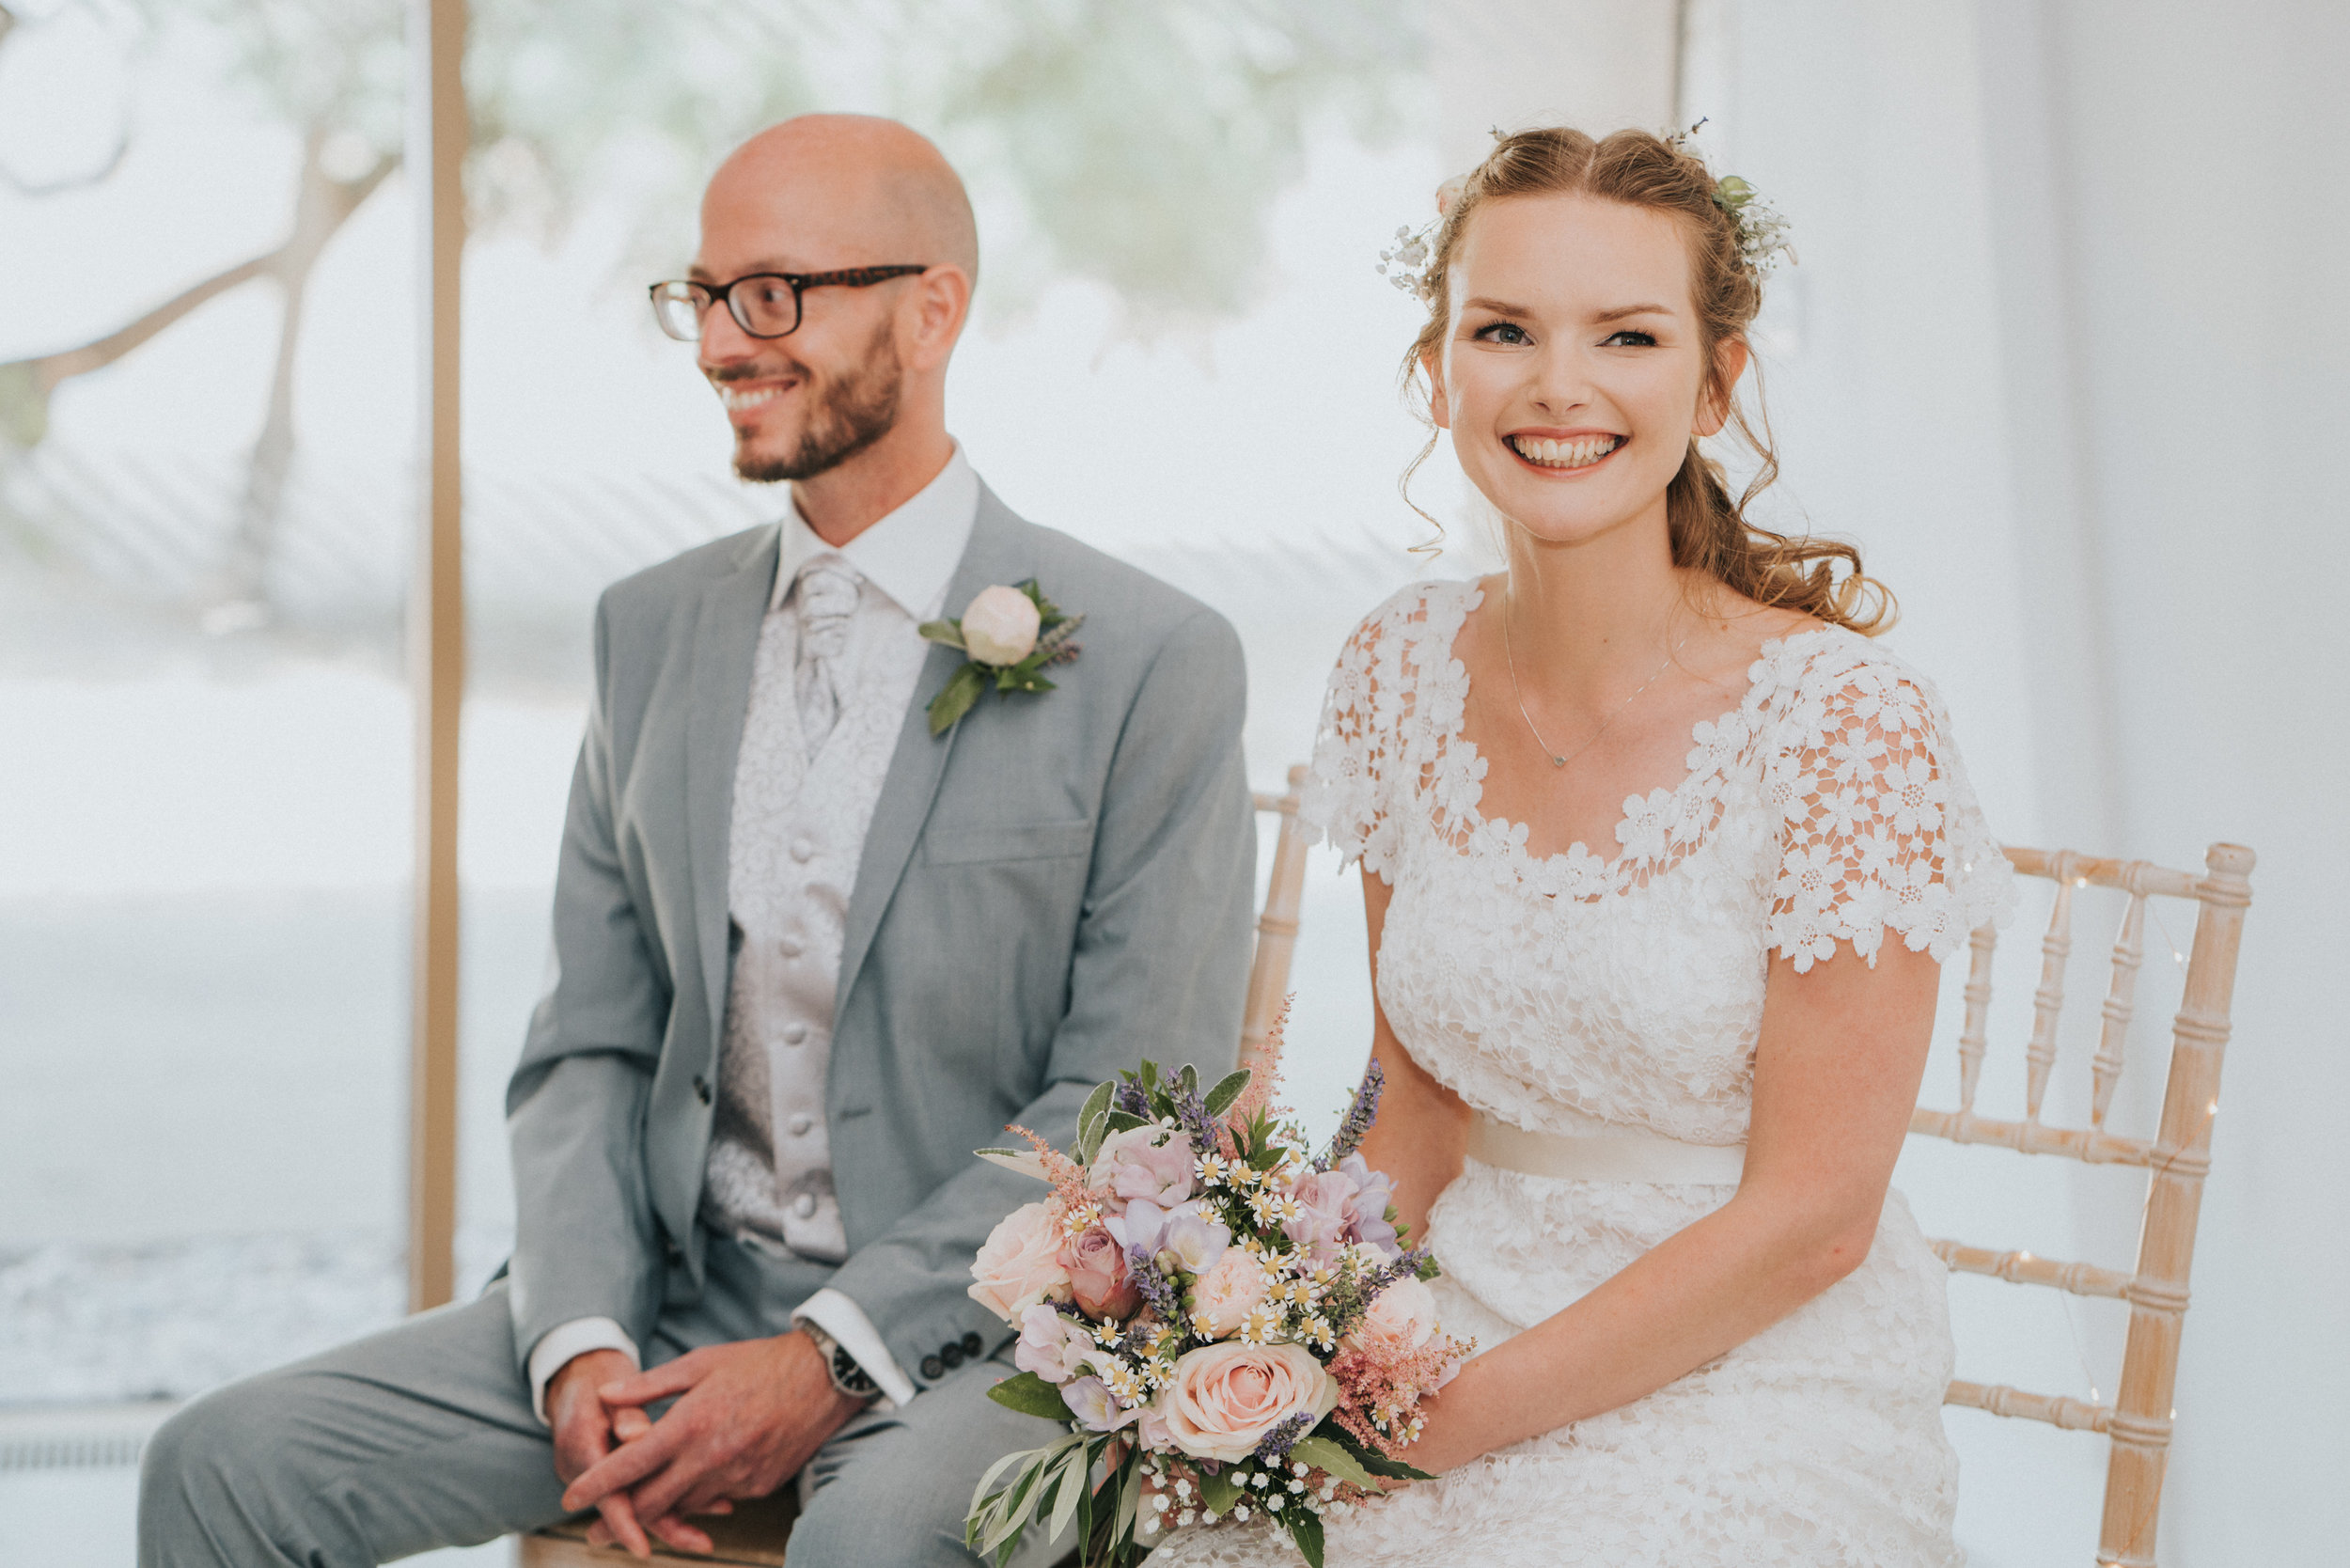 Grace-Elizabeth-Georgie-Amalaketu-Firstsite-Colchester-Essex-Boho-Buddhist-Wedding-Alternative-Wedding-Photography-Essex (46 of 100).jpg